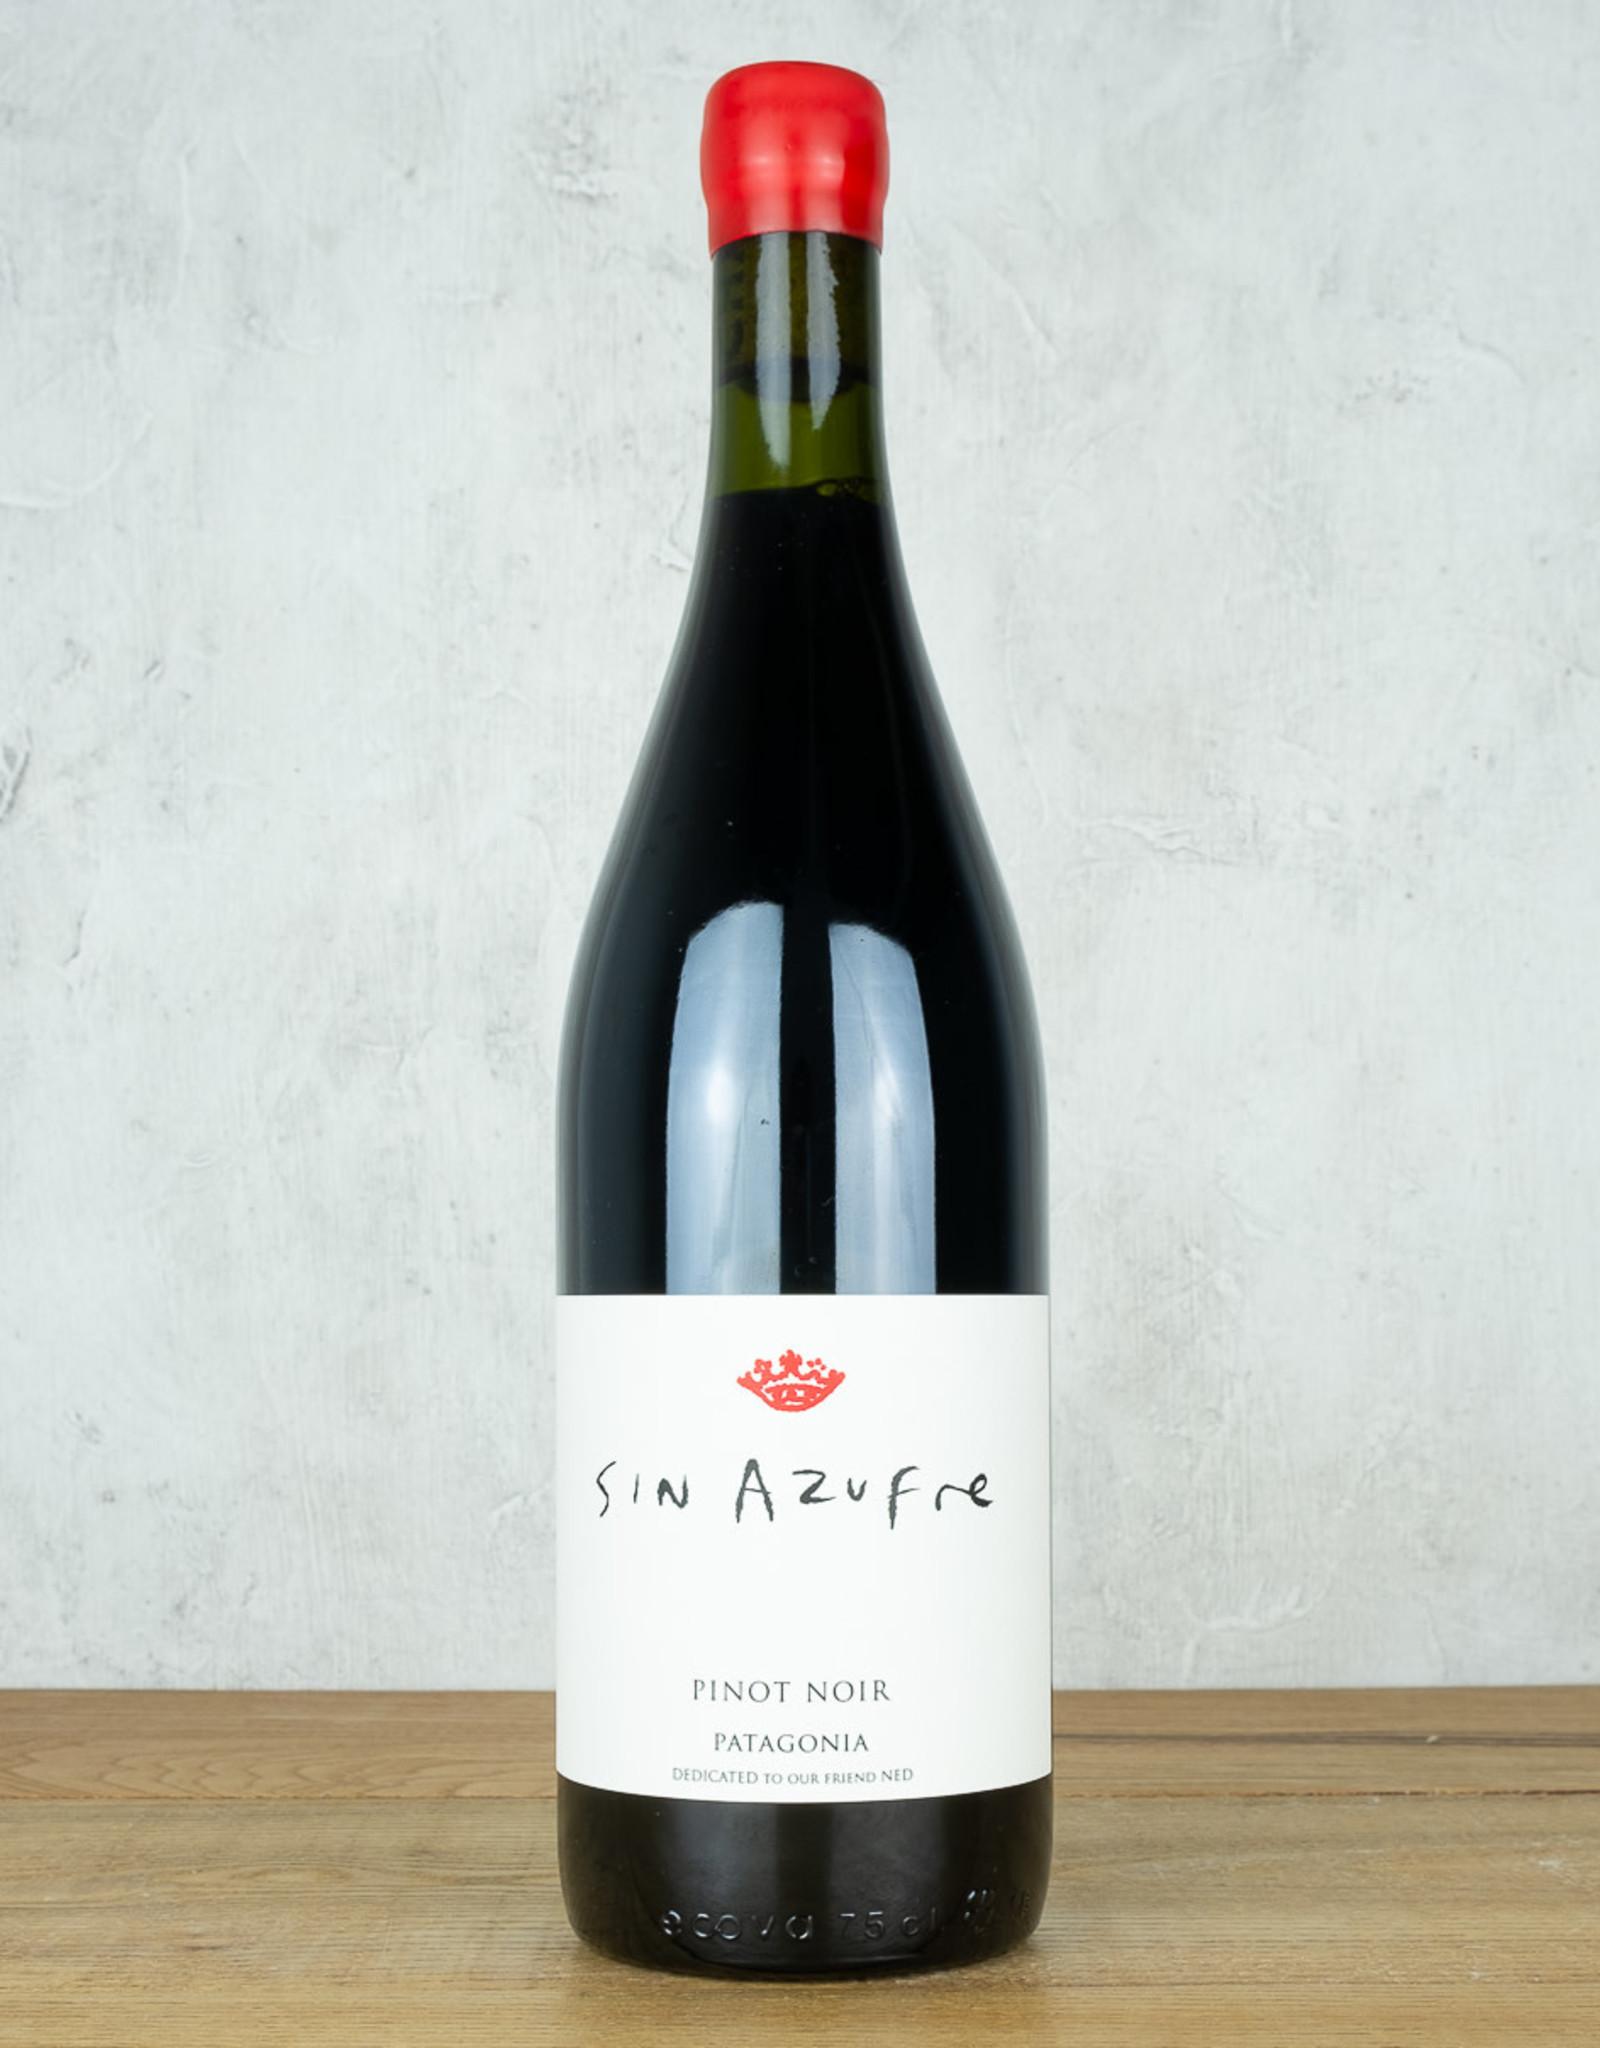 Bodega Chacra Sin Azufre Pinot Noir